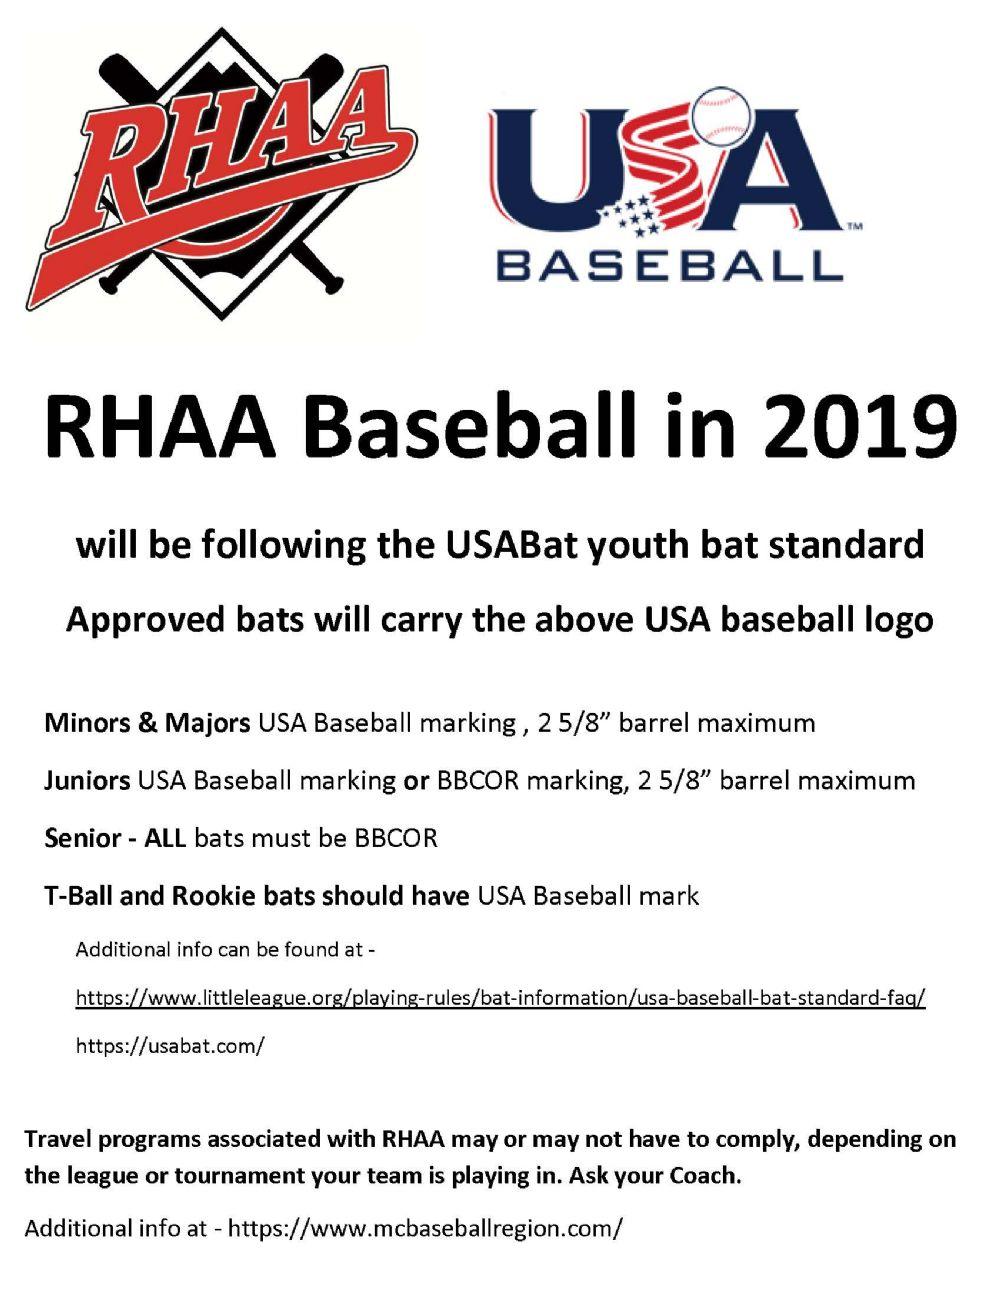 Rush Henrietta Athletic Association